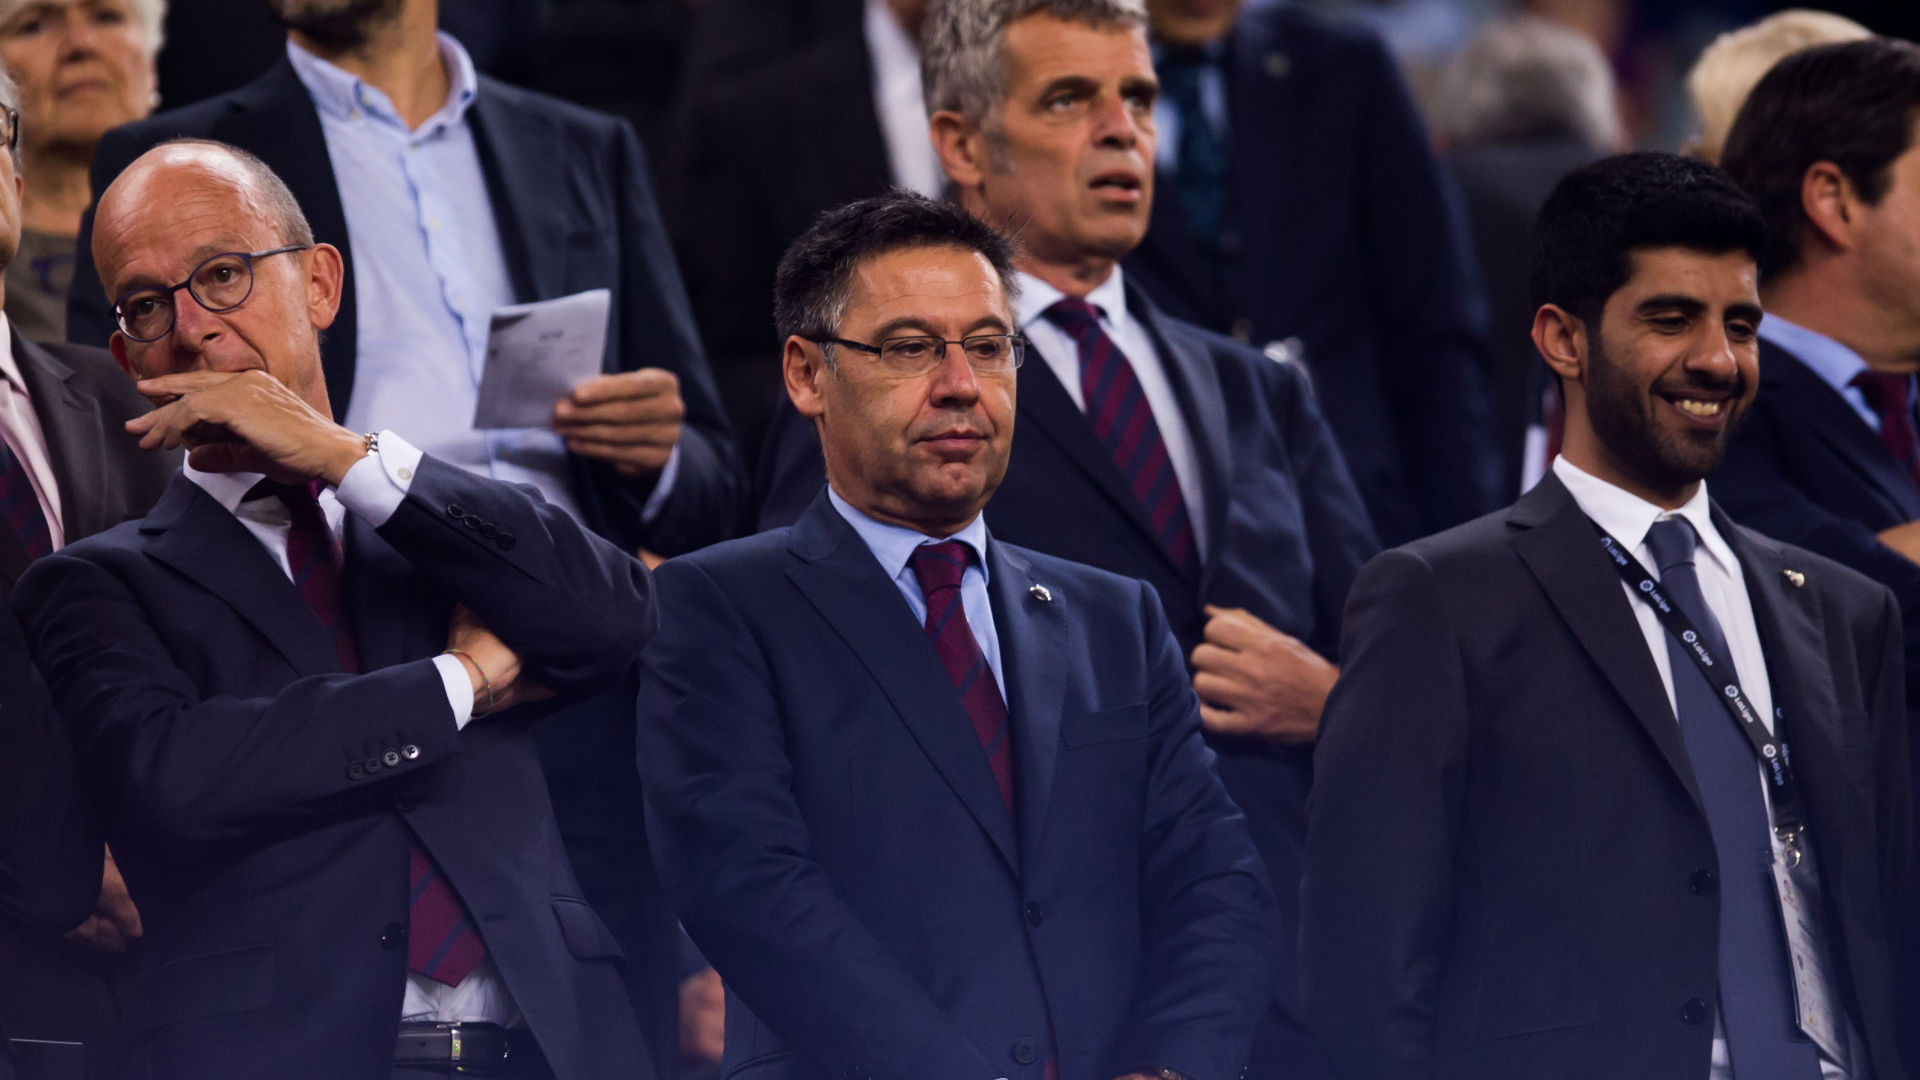 Barcelona did not use social media to discredit players – Bartomeu